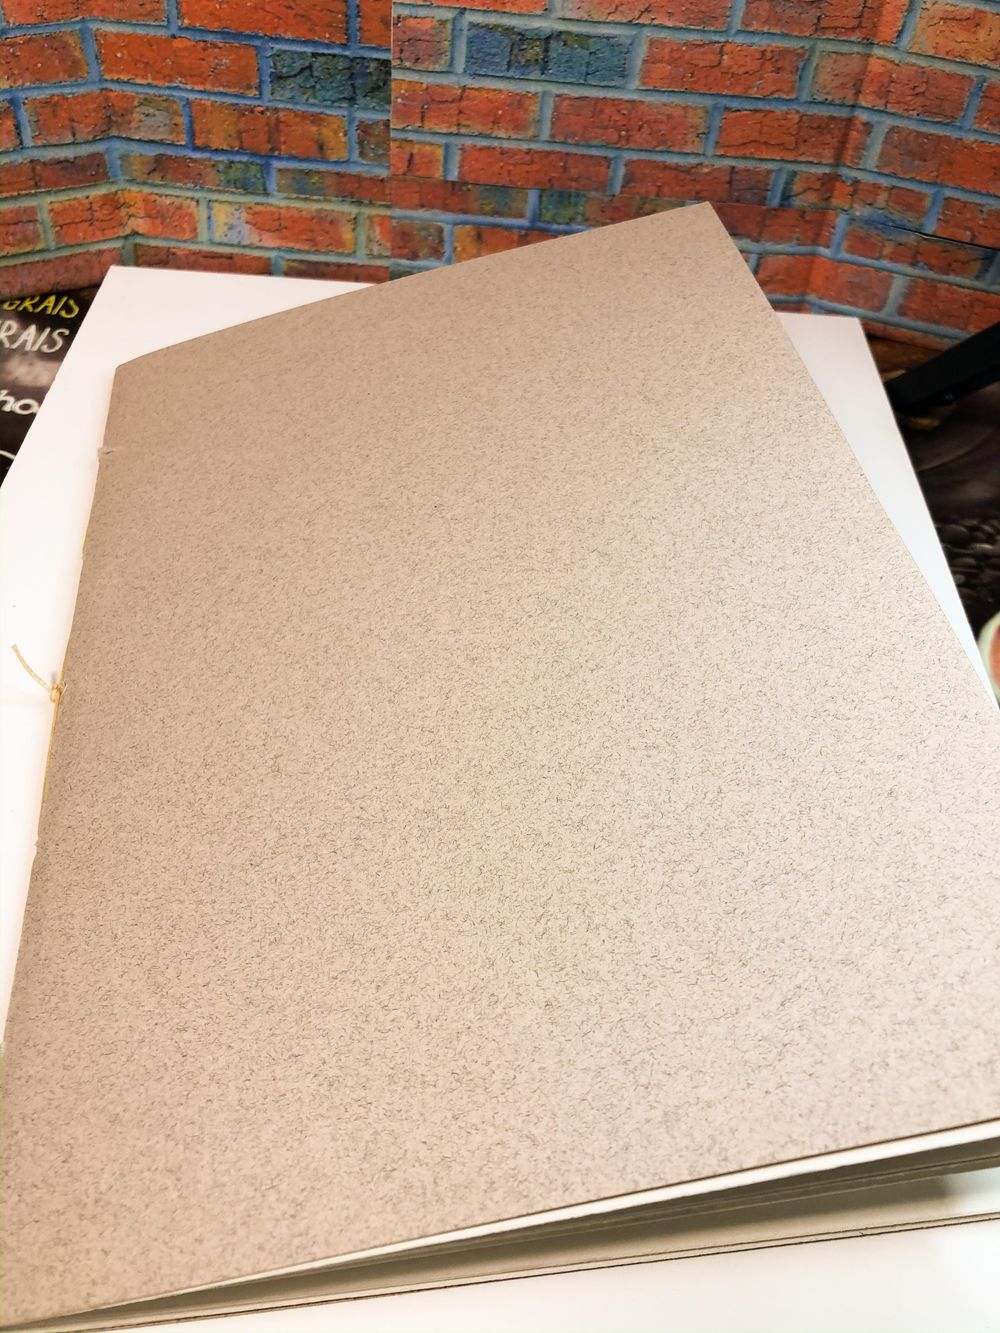 Sketchbook binding - image 1 - student project